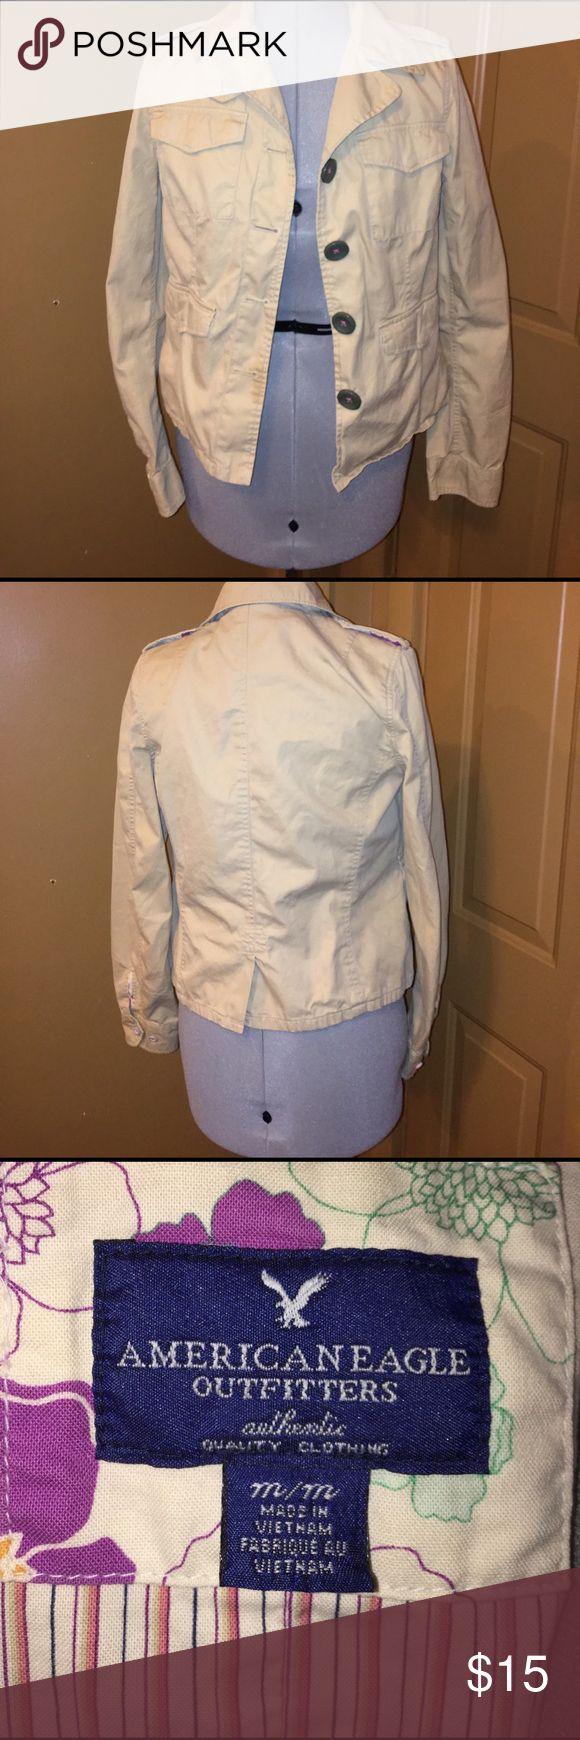 American Eagle jacket size Medium Tan American Eagle Jacket with olive green buttons size Medium. Smoke free home and dog mom. American Eagle Outfitters Jackets & Coats